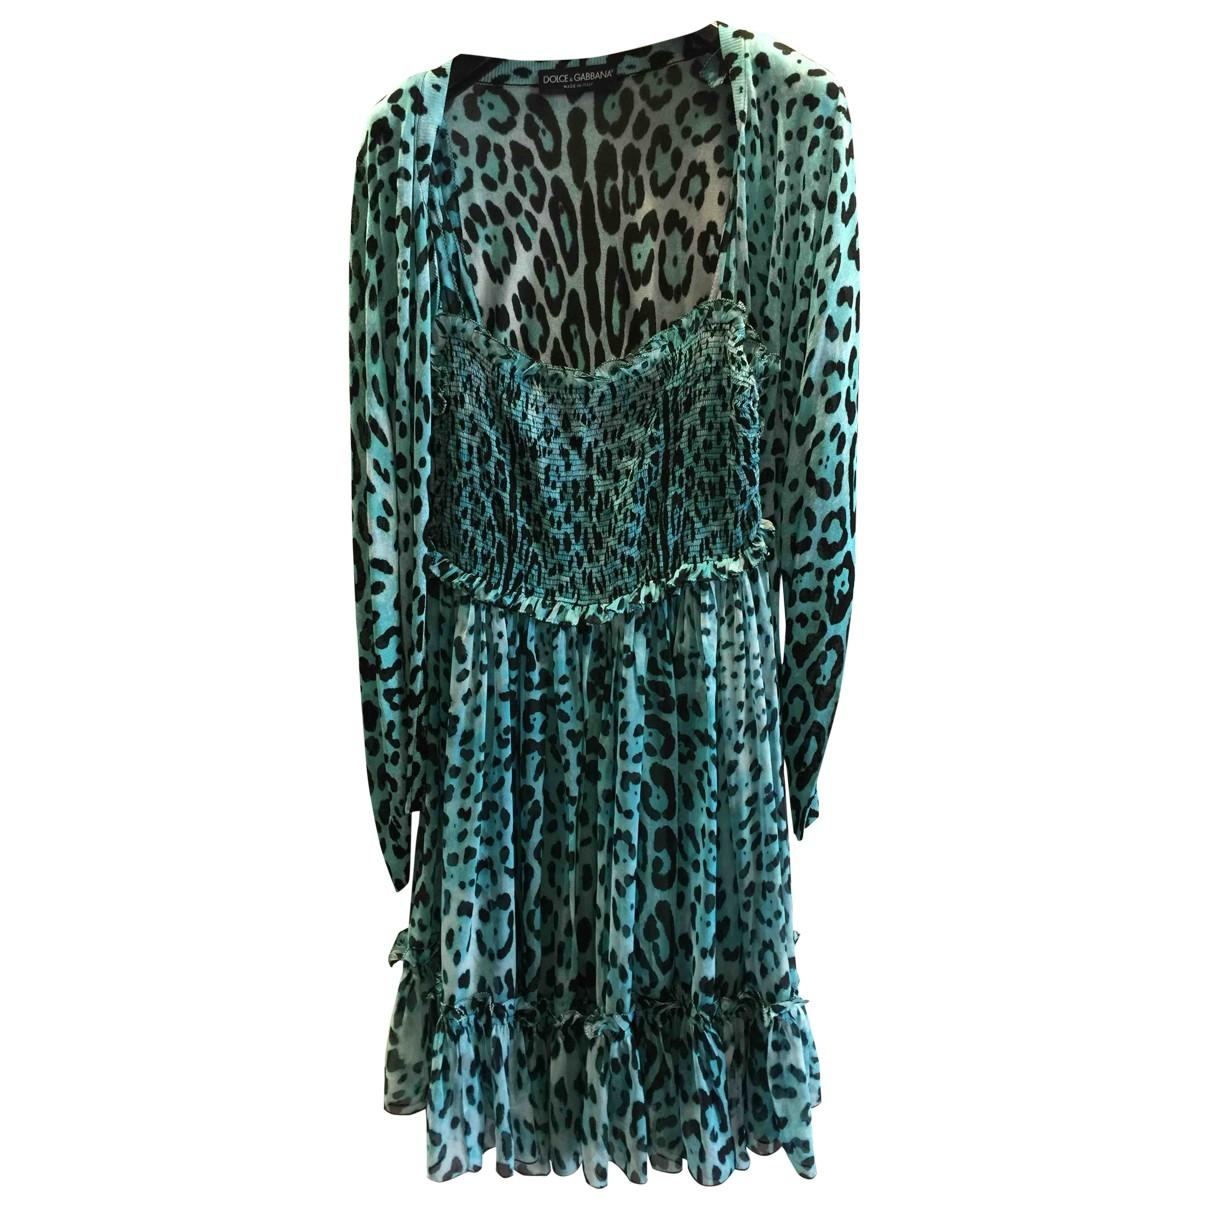 Dolce & Gabbana \N Turquoise Silk dress for Women 42 IT